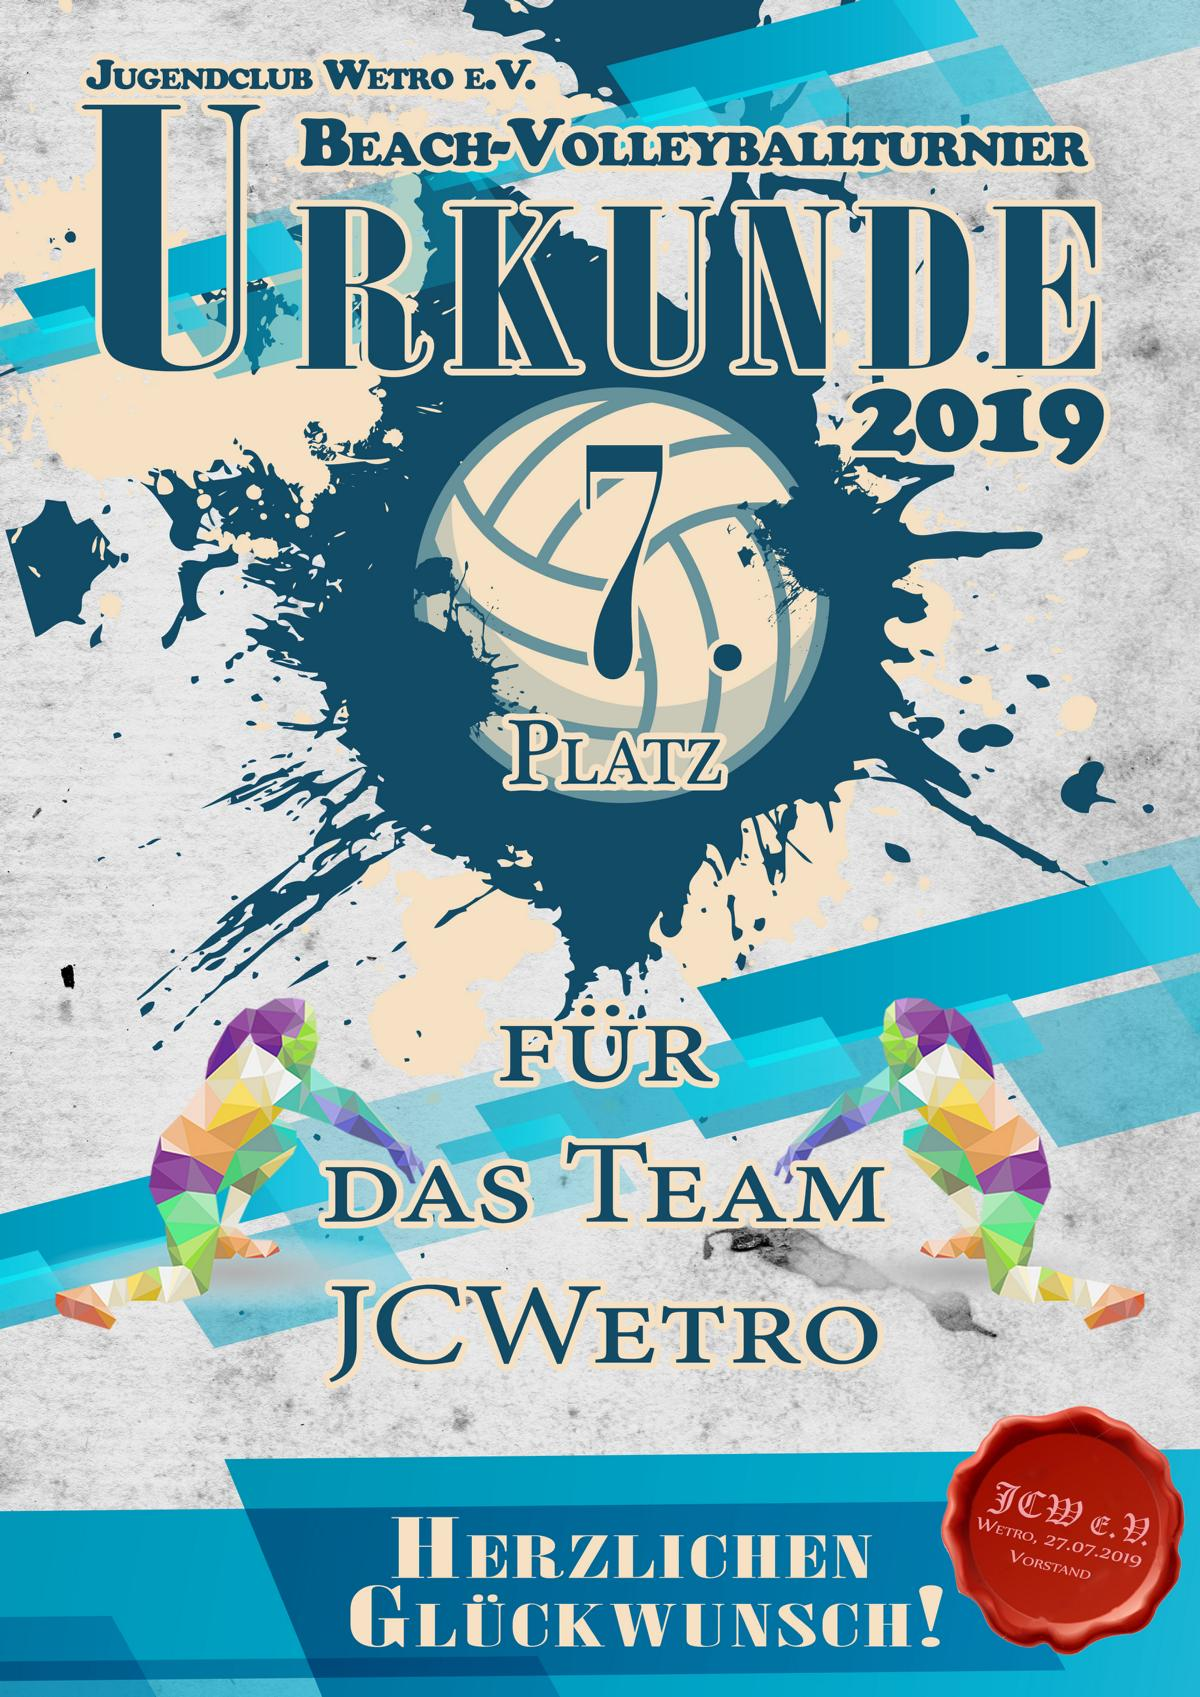 http://www.jugendclub-wetro.de/wp-content/uploads/2019/07/07_VBT2k19_JCW.jpg